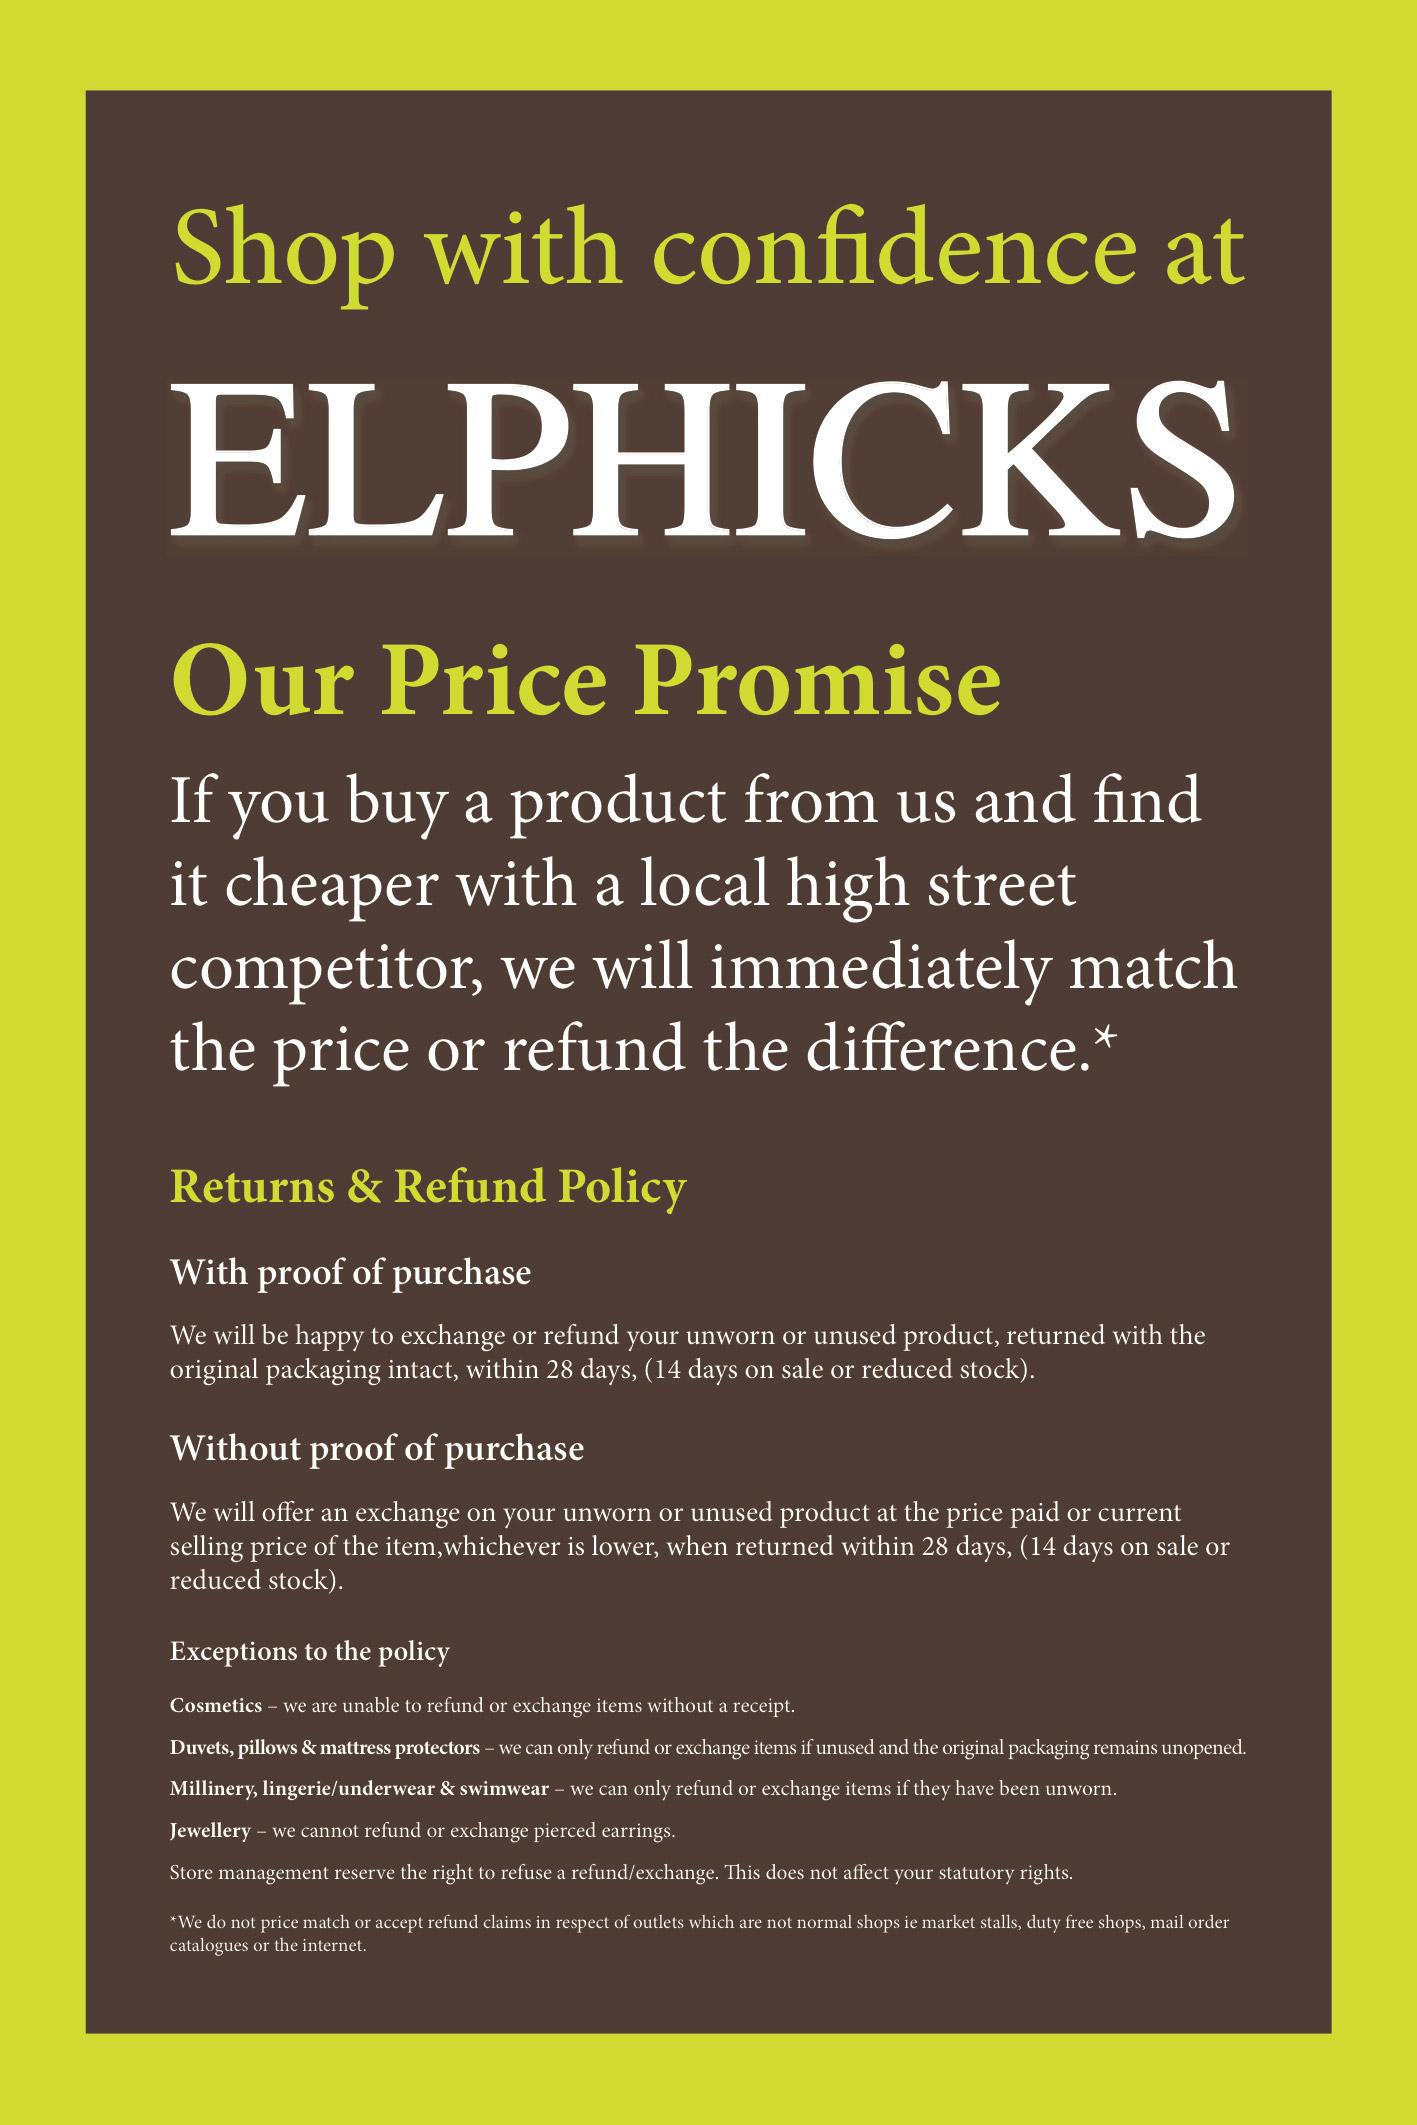 Elphicks-Price-Promise